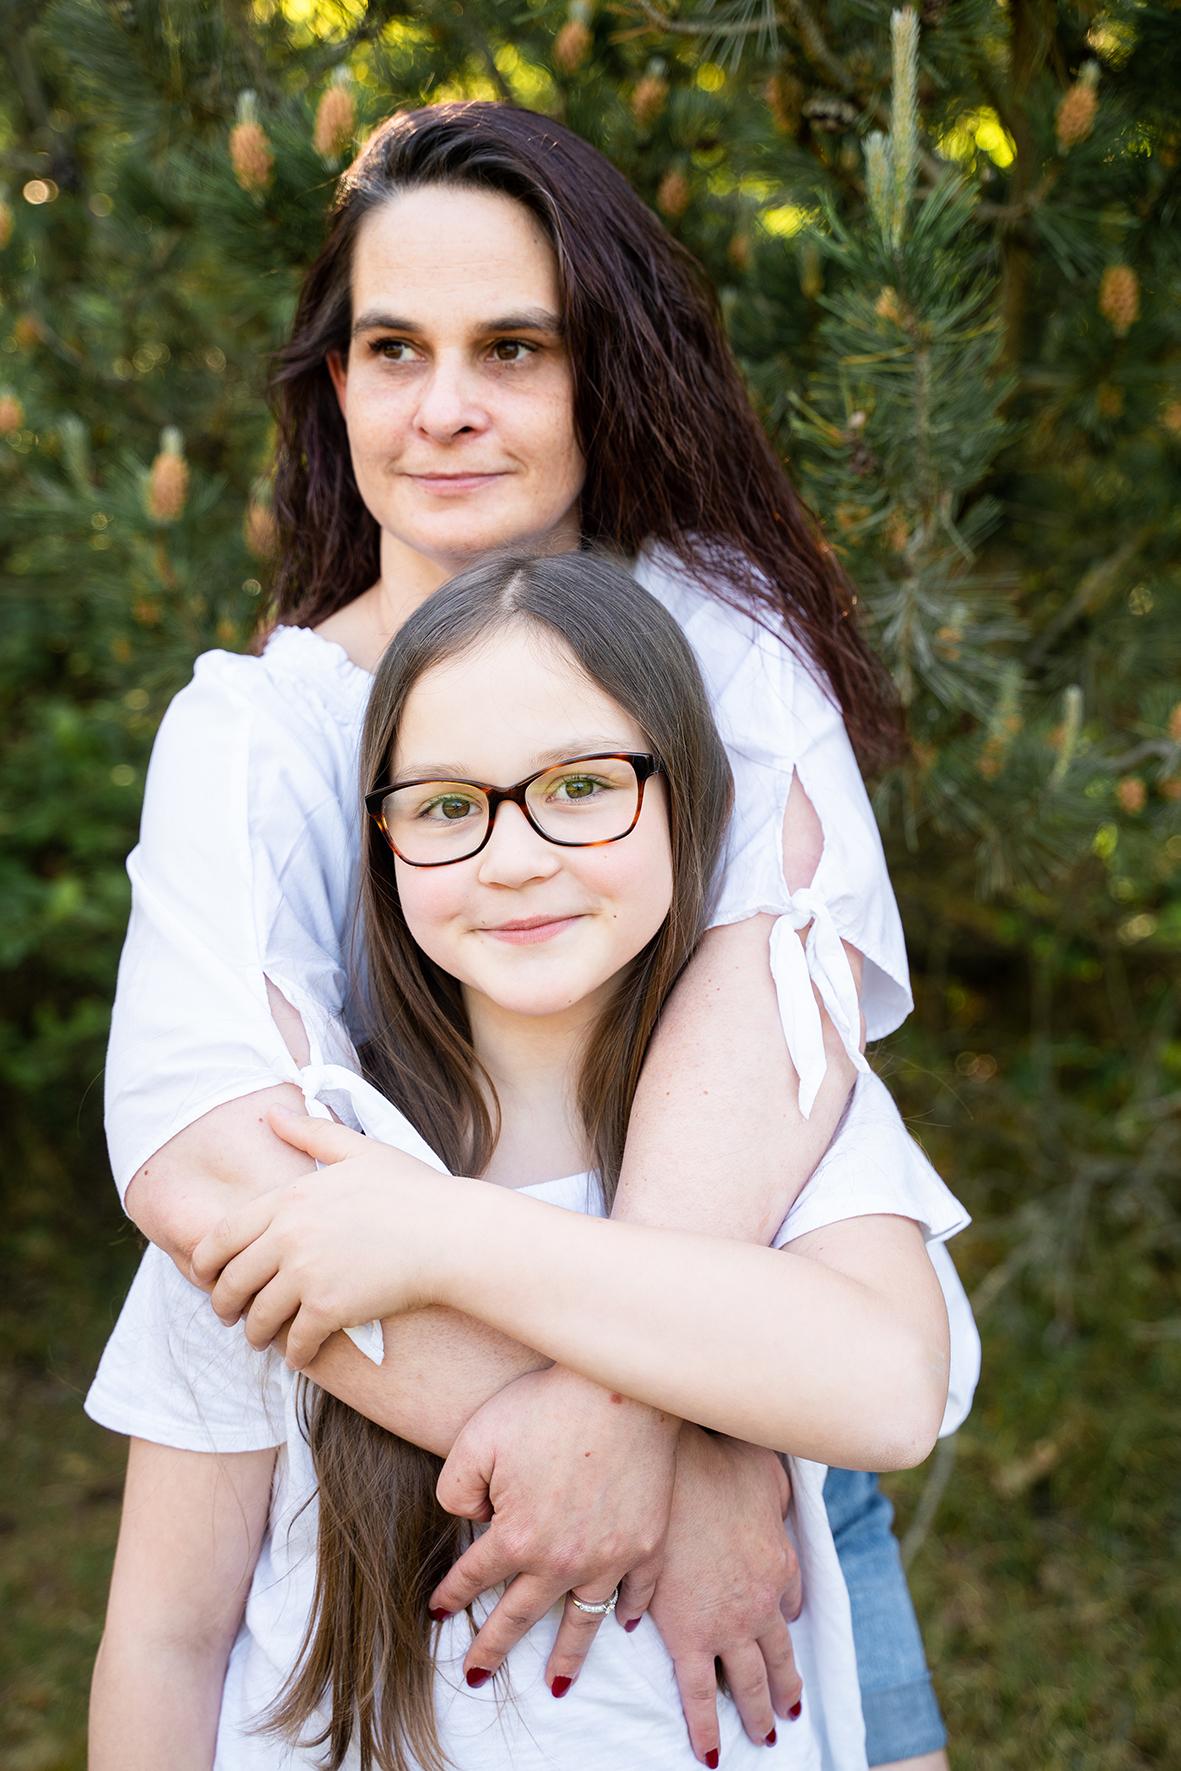 Familienfotos Fotoshooting Fotografin Bremen Umarmung beim Shooting